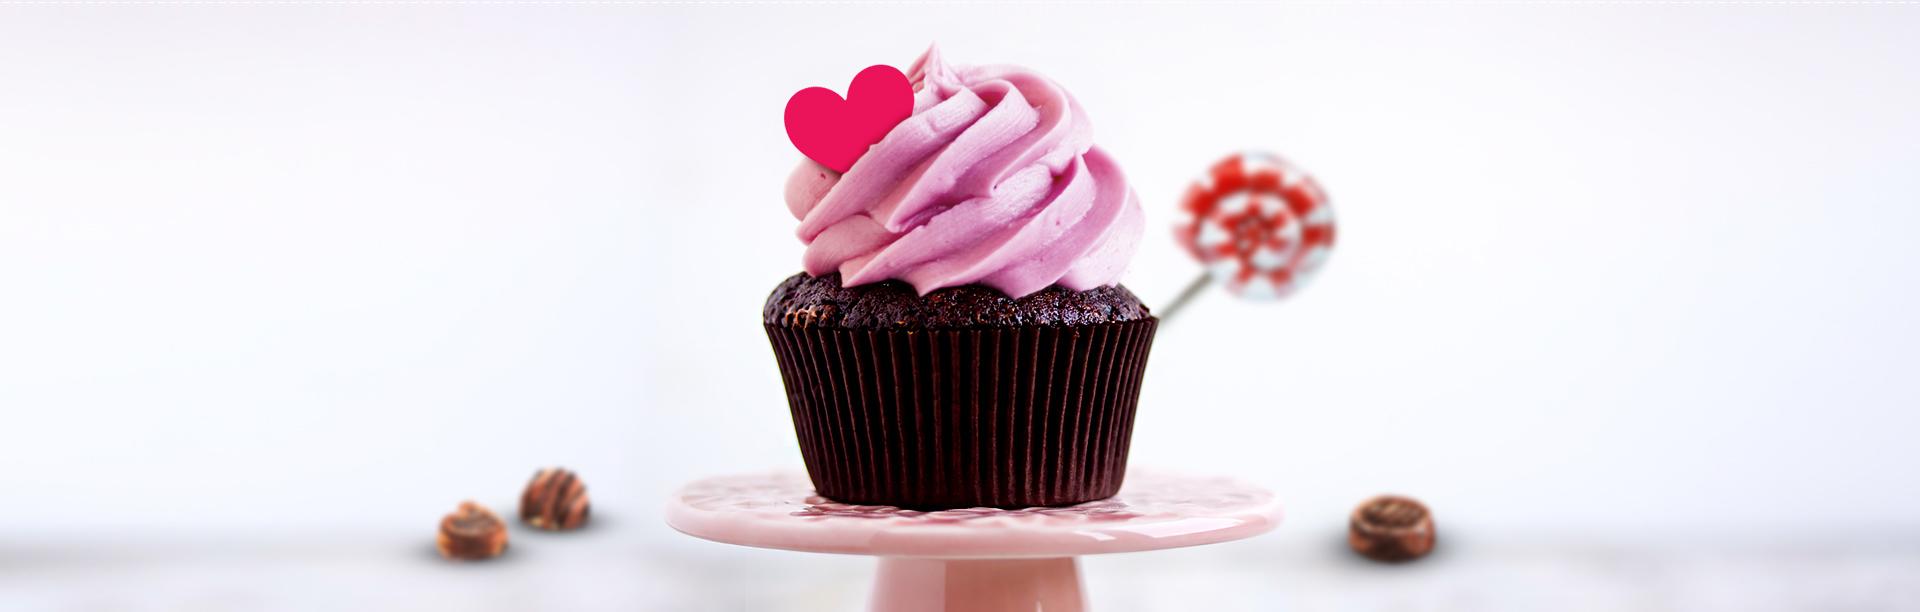 Annikka Toni Cake Design Pastry